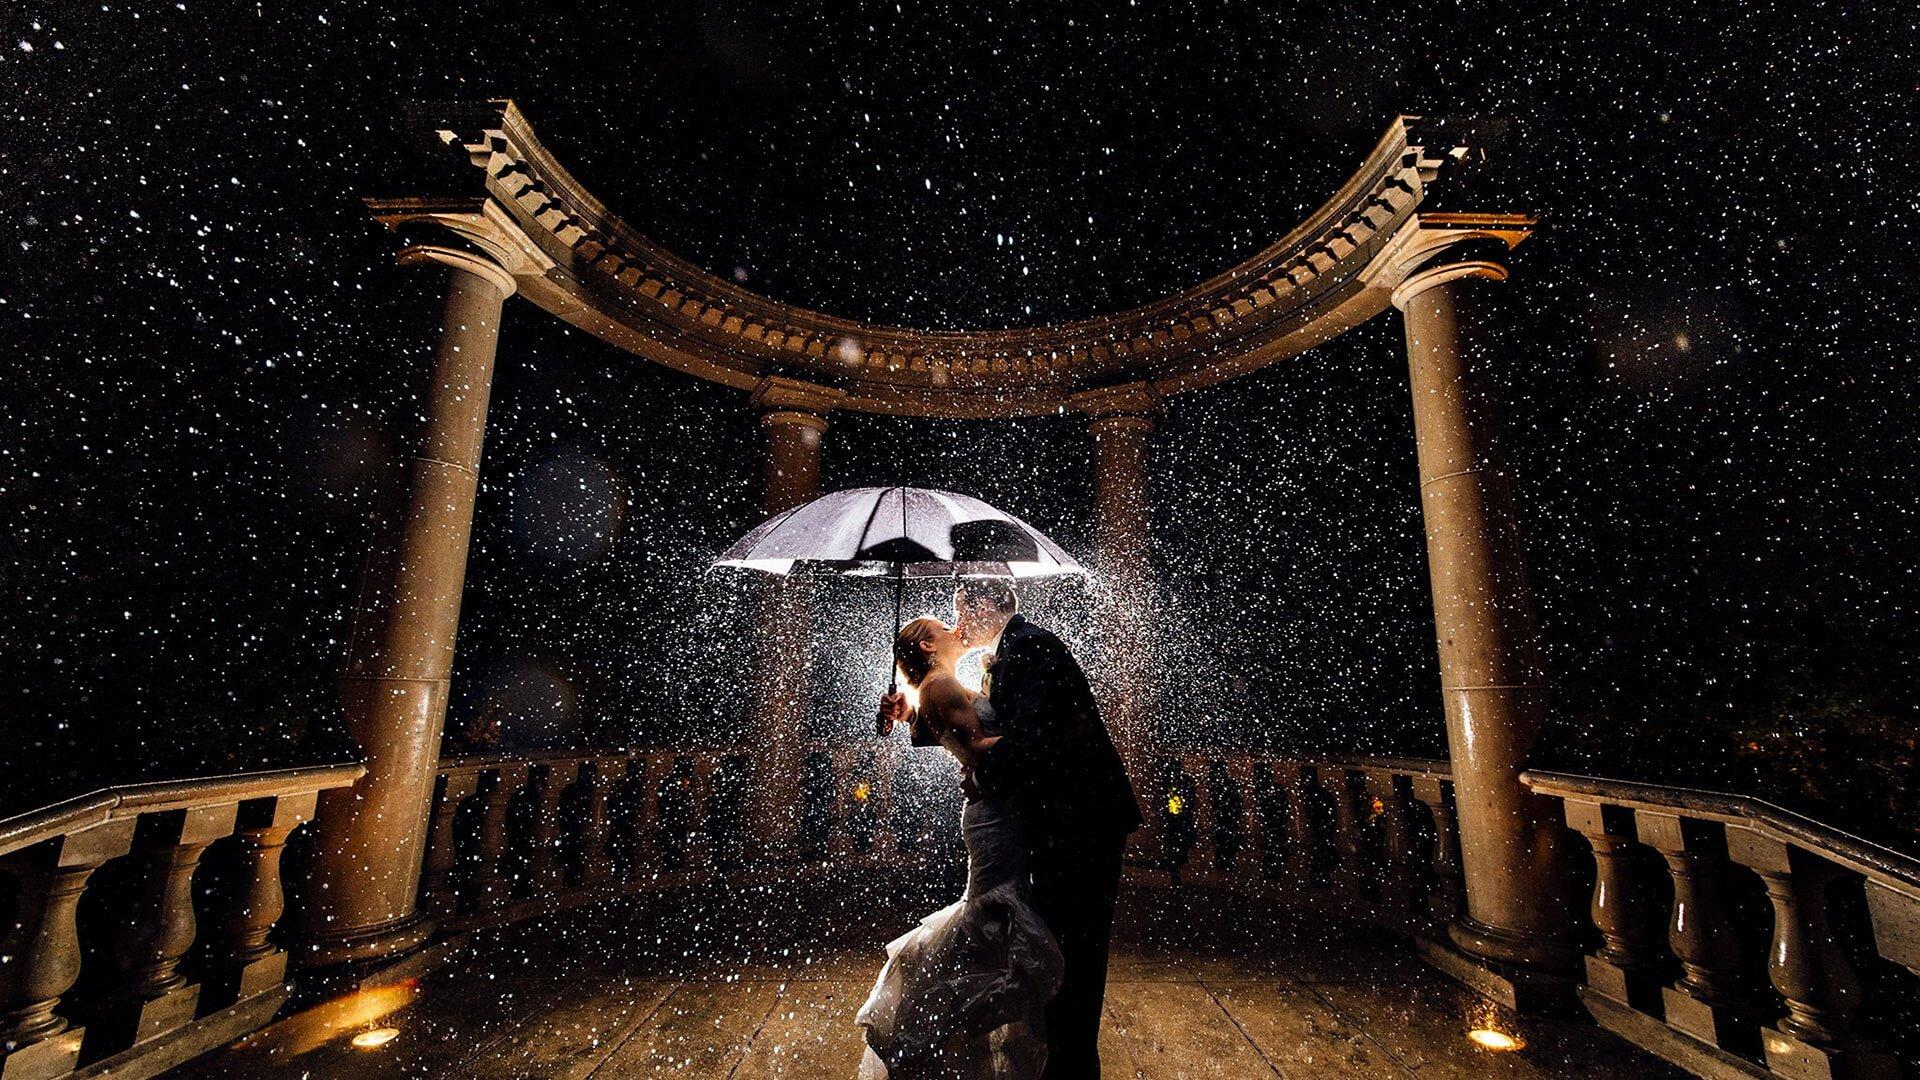 kiss in rain under umbrella